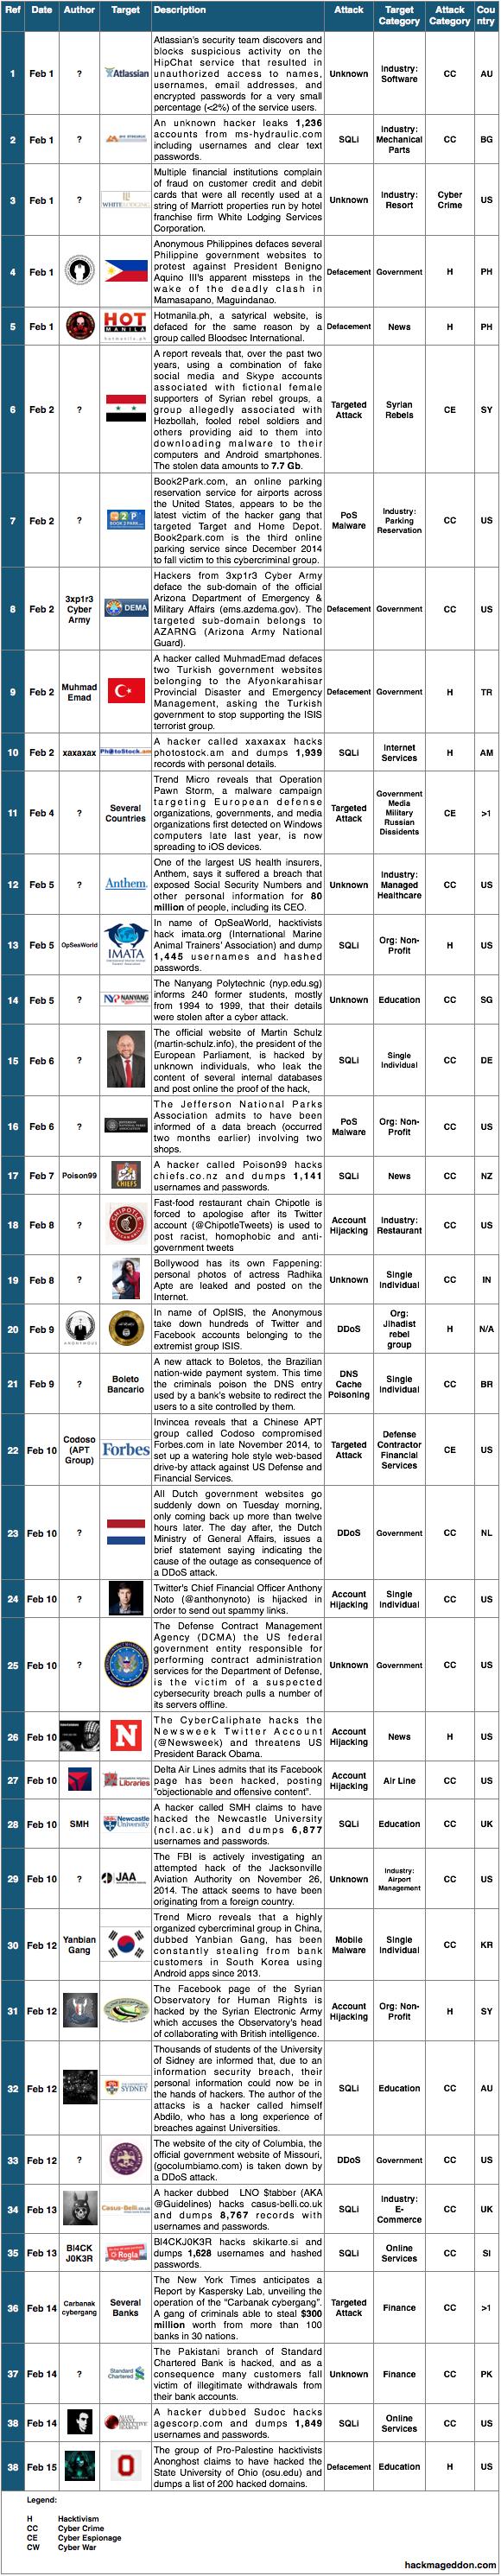 1 15 February 2015 Cyber Attacks Timeline Hackmageddon